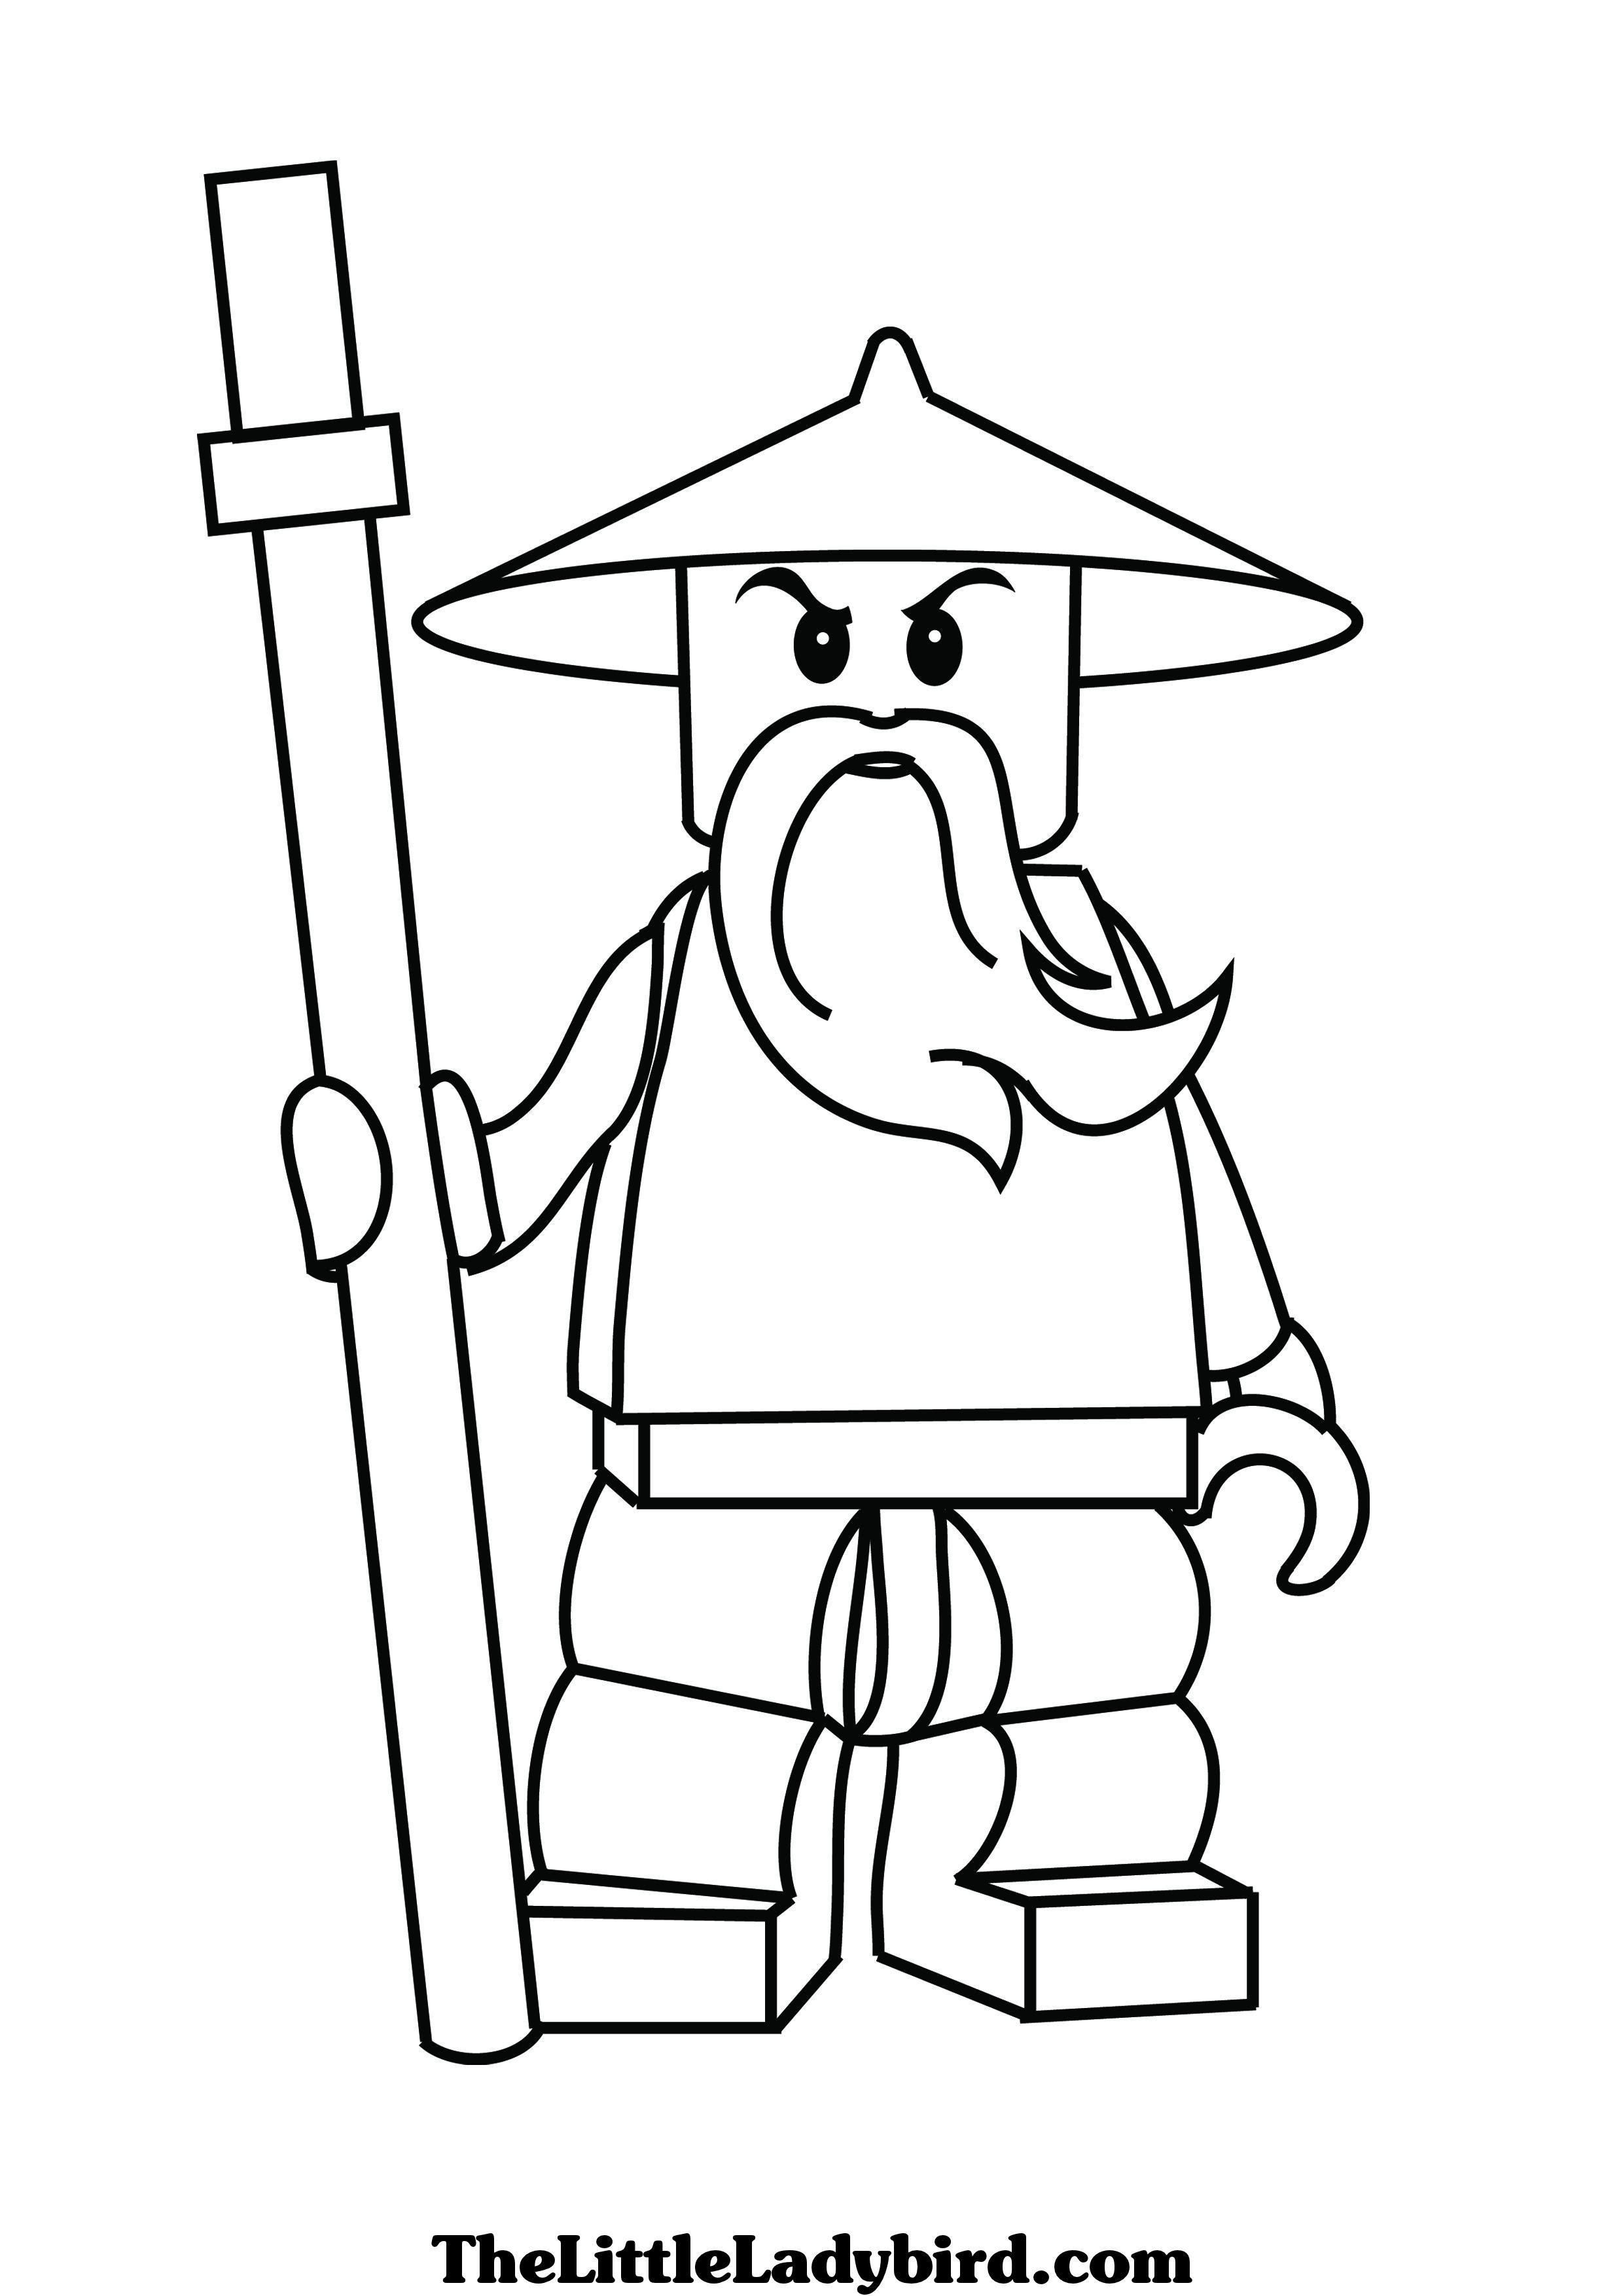 Coloriage ninjago gratuit dessin a imprimer 77